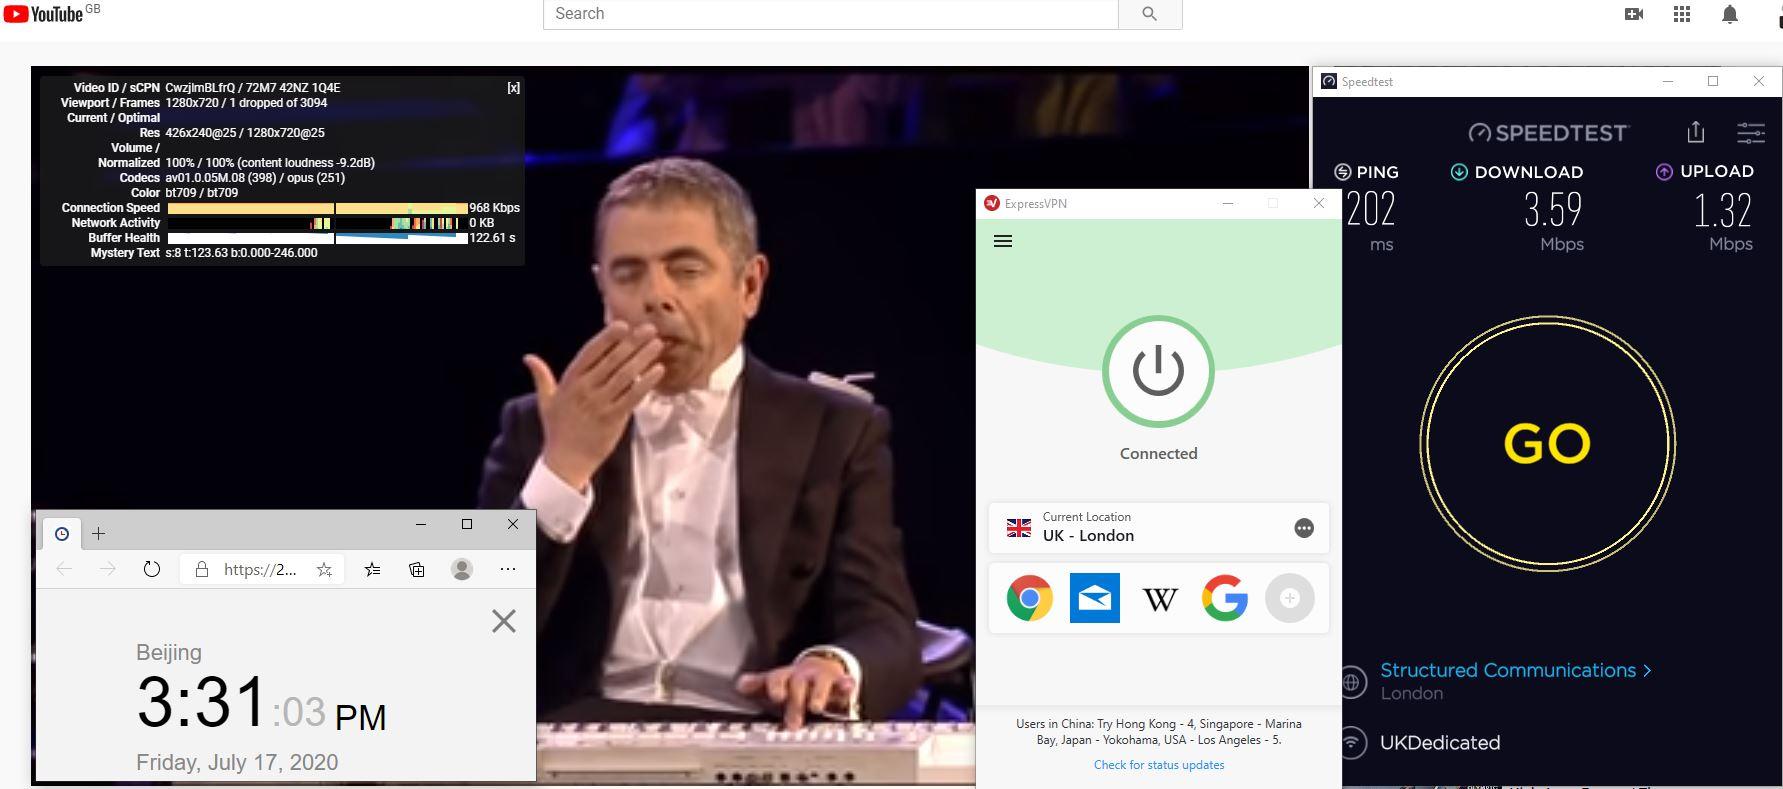 Windows10 ExpressVPN IKEv2 UK - London 中国VPN 翻墙 科学上网 测速-20200717